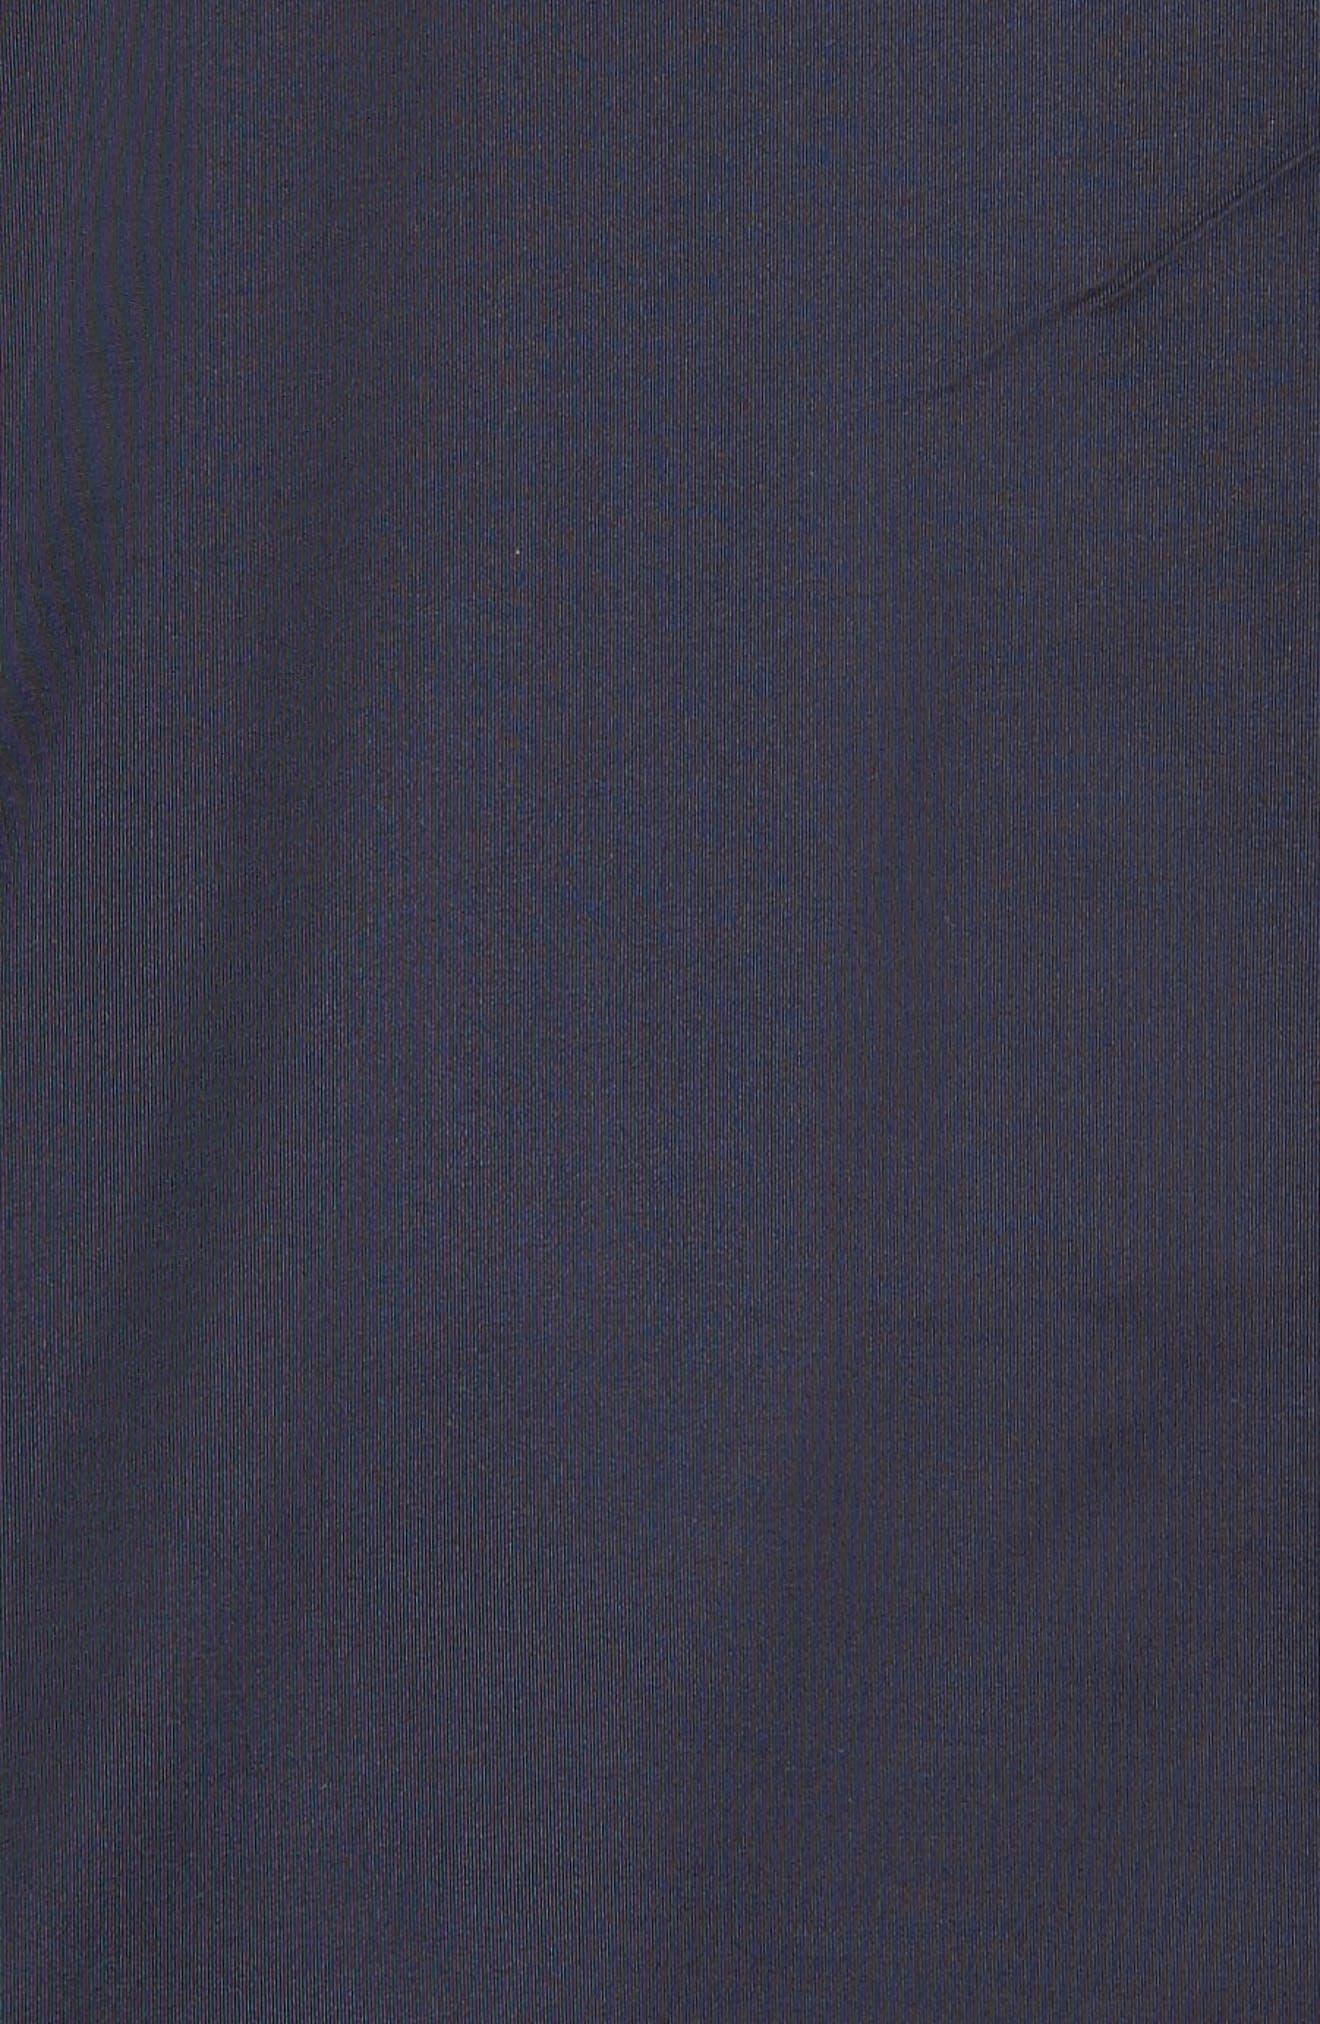 Paul&Shark Colorblock Mixed Media Zip Front Jacket,                             Alternate thumbnail 5, color,                             400